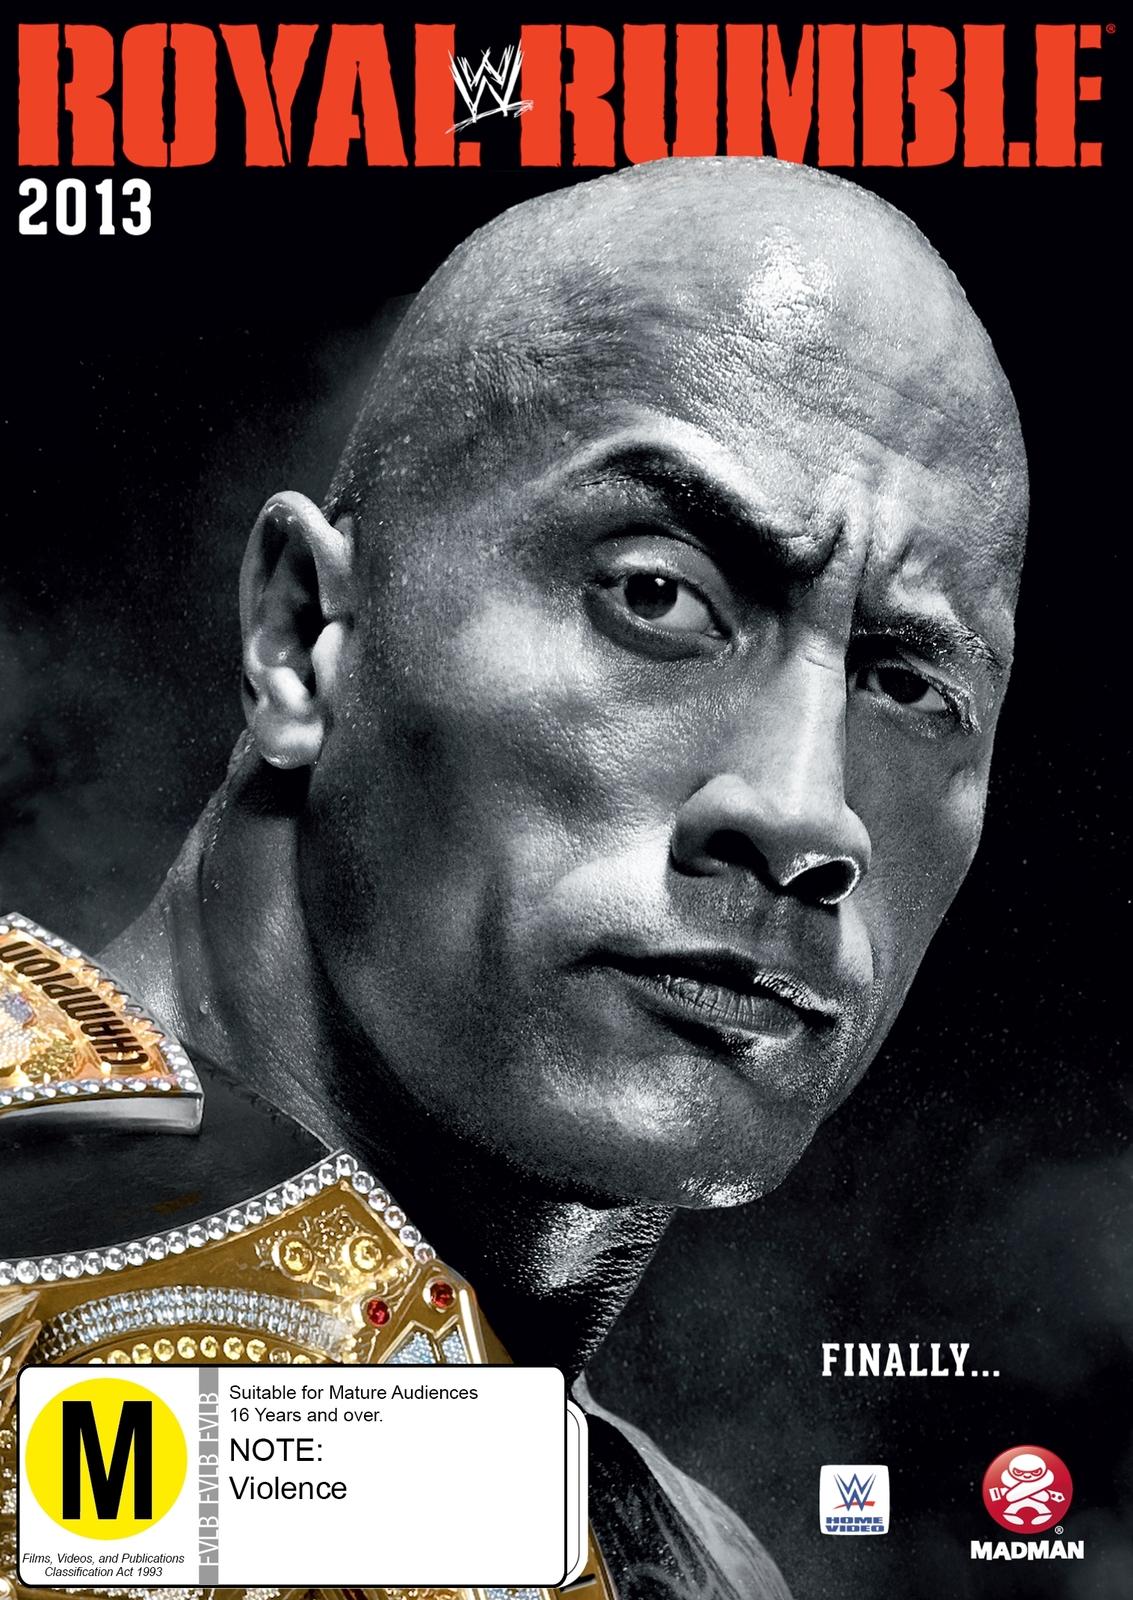 WWE Royal Rumble 2013 on DVD image